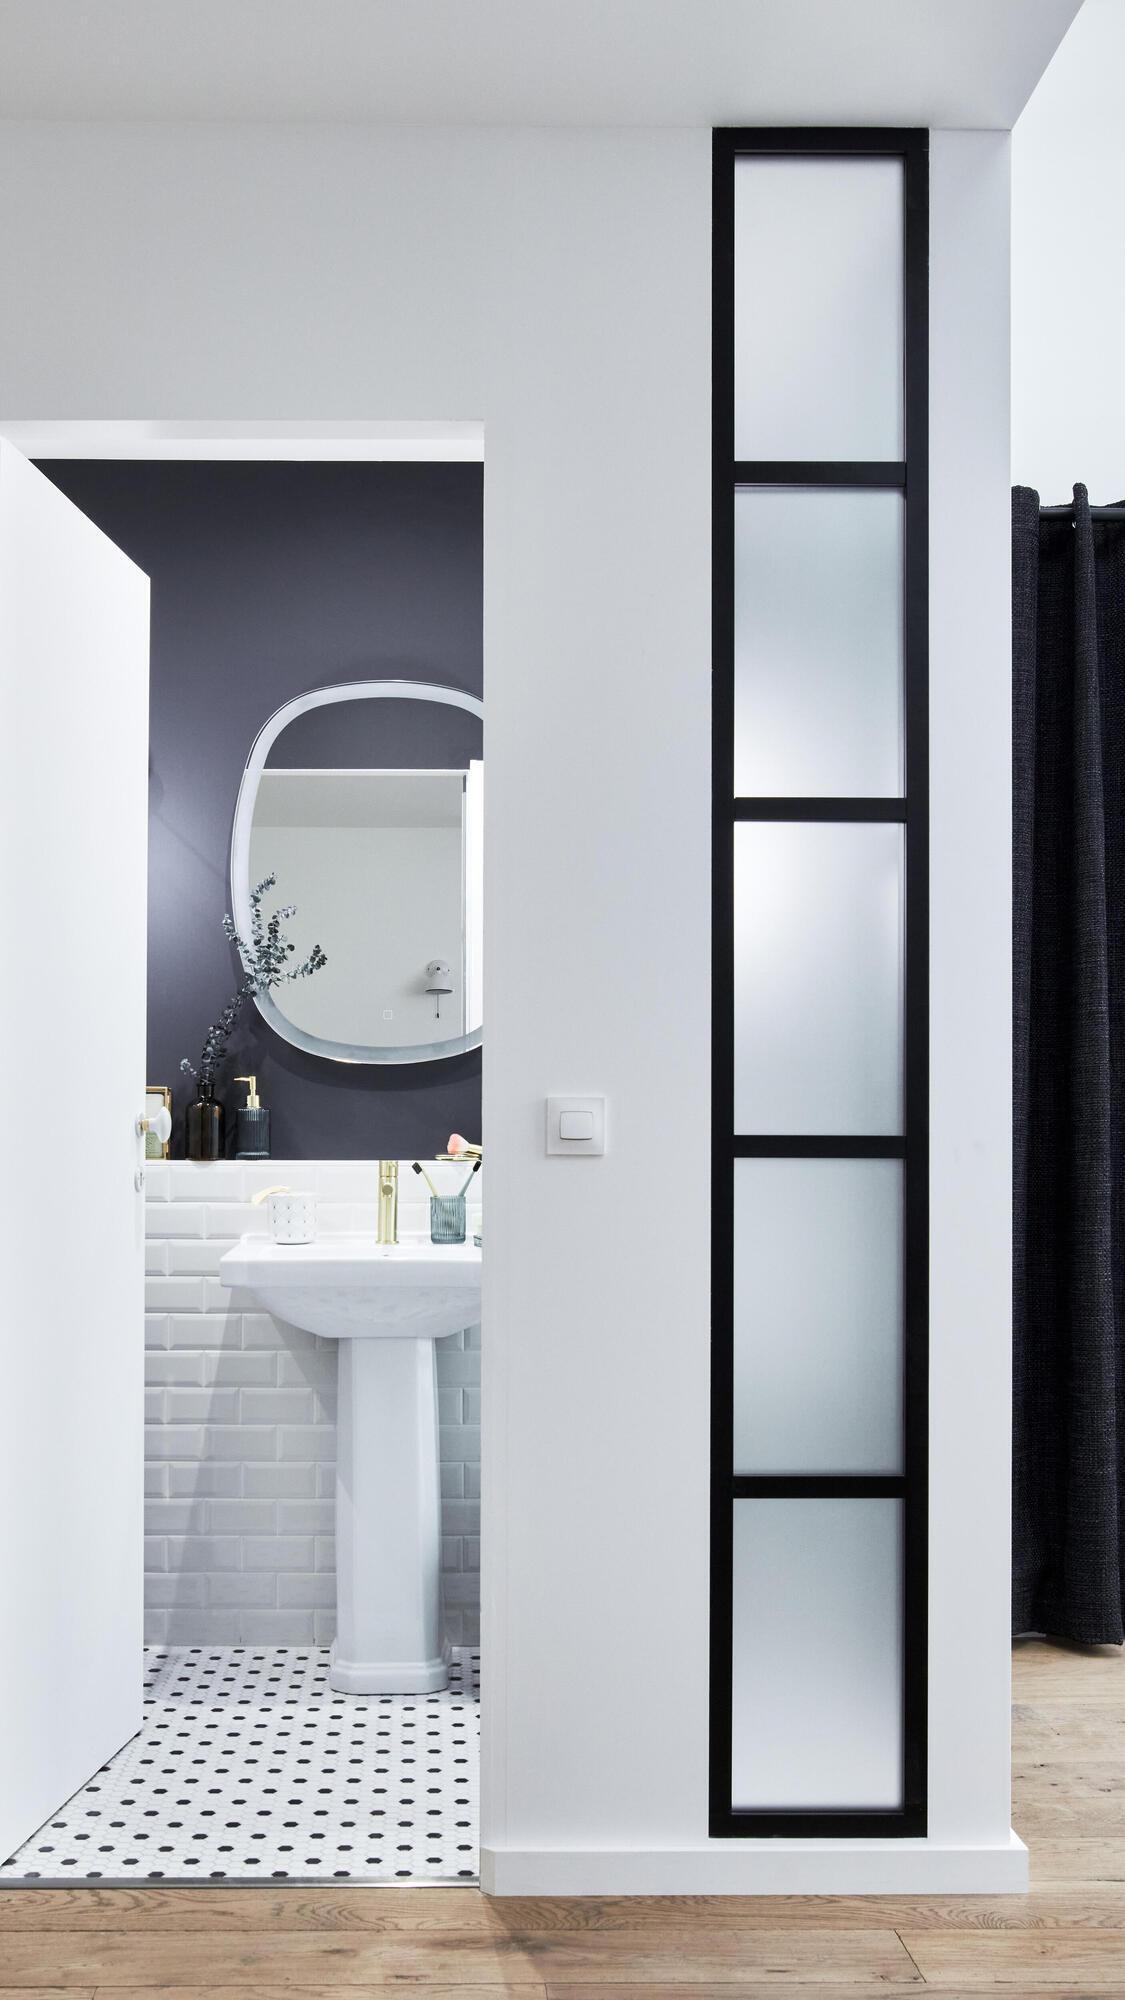 Lavabo quadrato L 43 x P 39.5 cm in ceramica bianco - 6